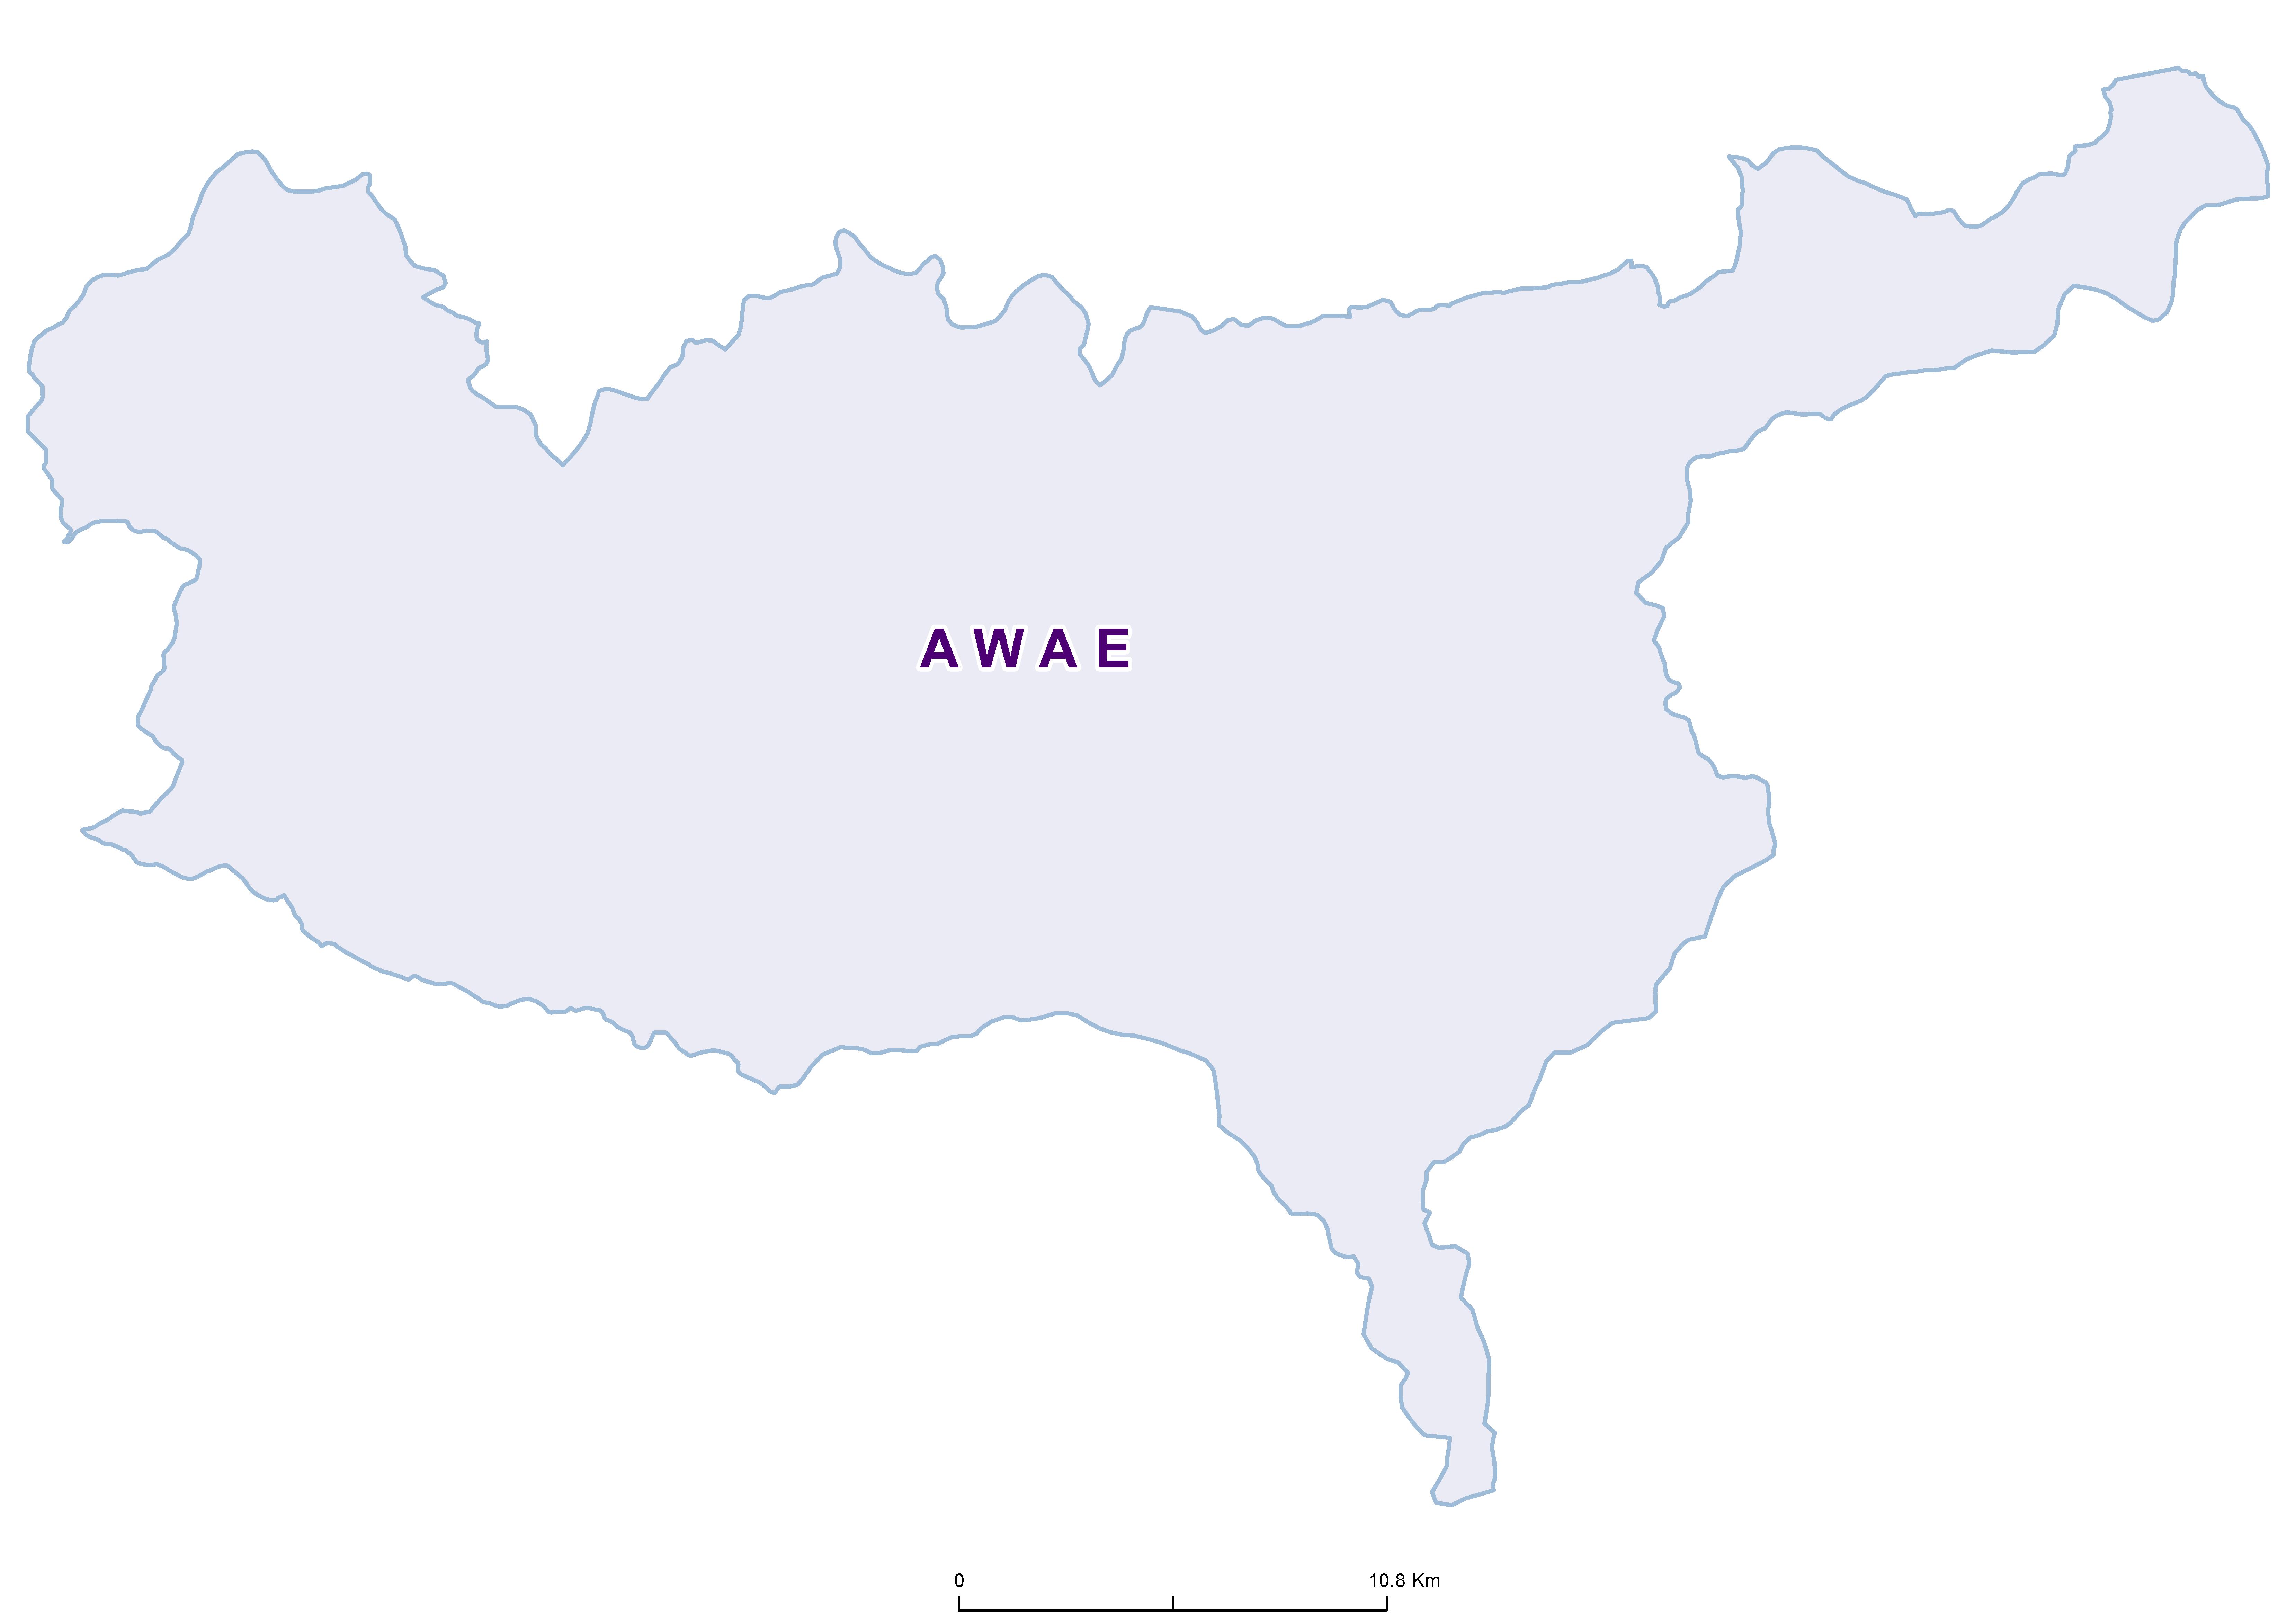 Awae Max STH 20180001